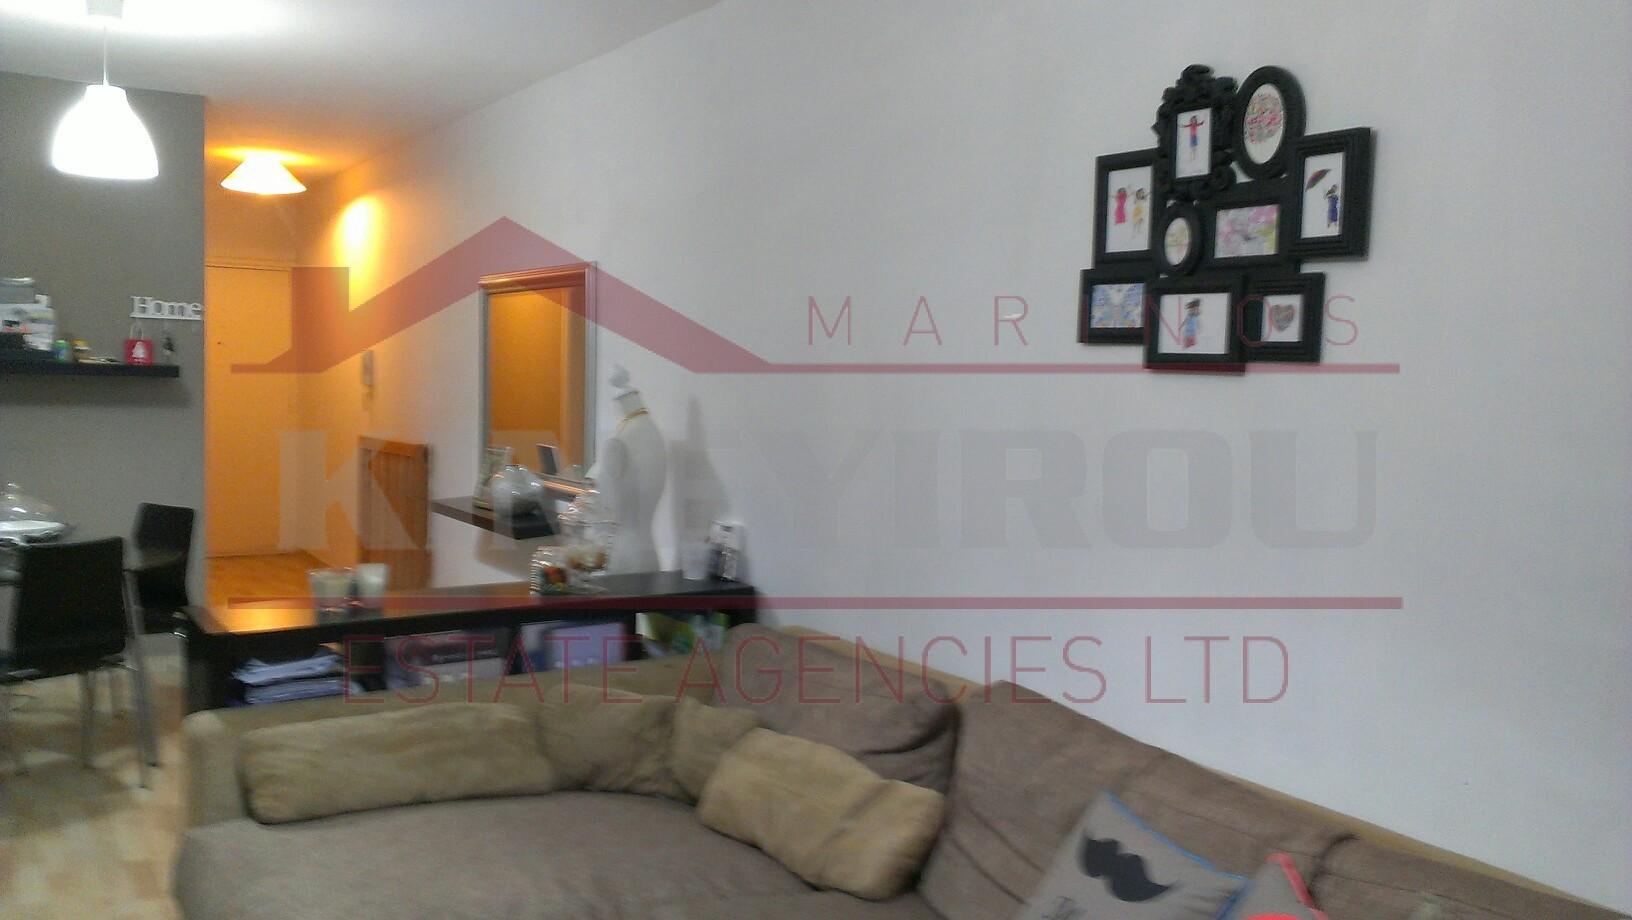 2 bedroom apartment for sale near New Hospital, Larnaca